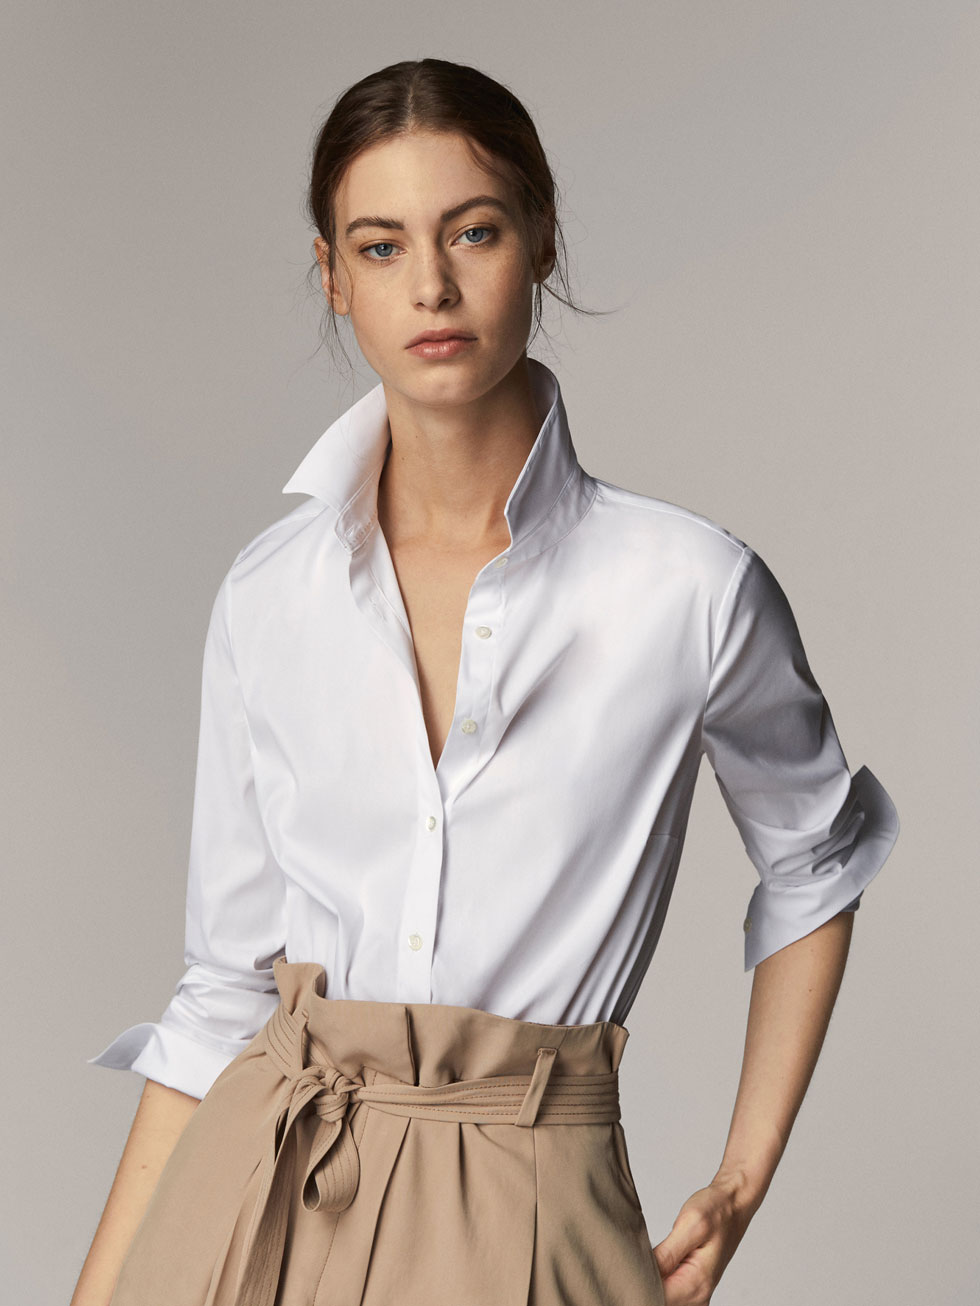 Plain white shirts - Shirts & Blouses - WOMEN - Massimo Dutti